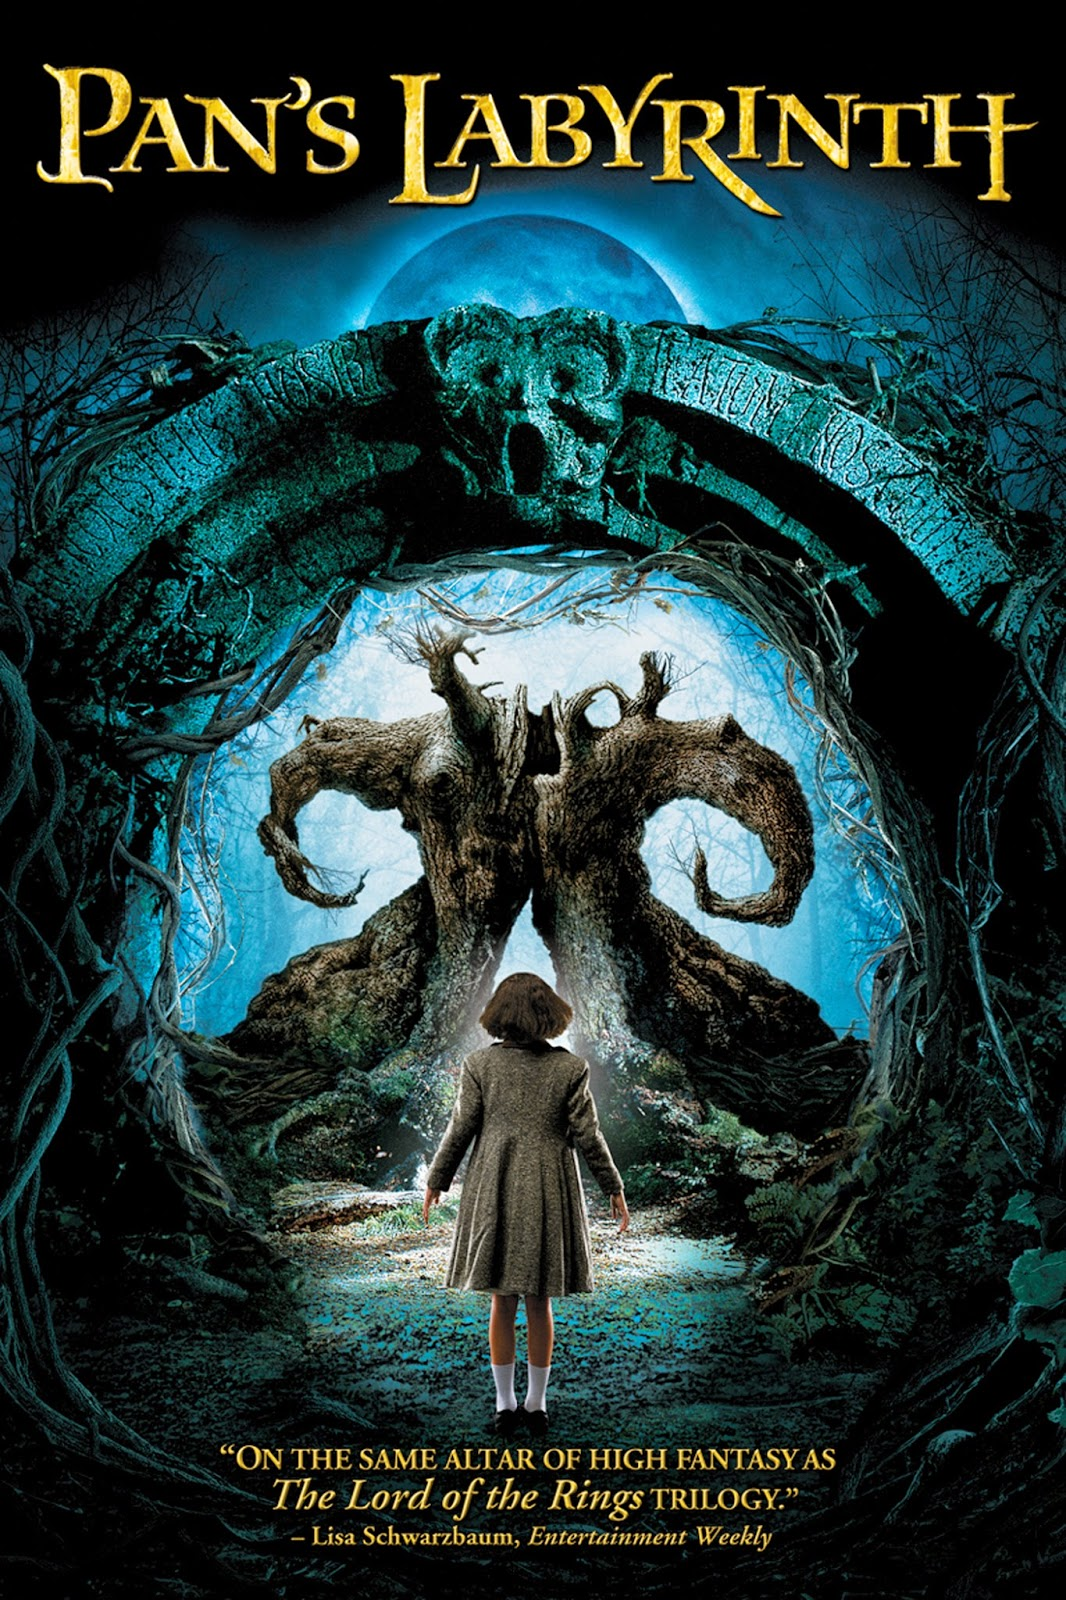 Pan's Labyrinth อัศจรรย์แดนฝัน มหัศจรรย์เขาวงกต [HD][พากย์ไทย]